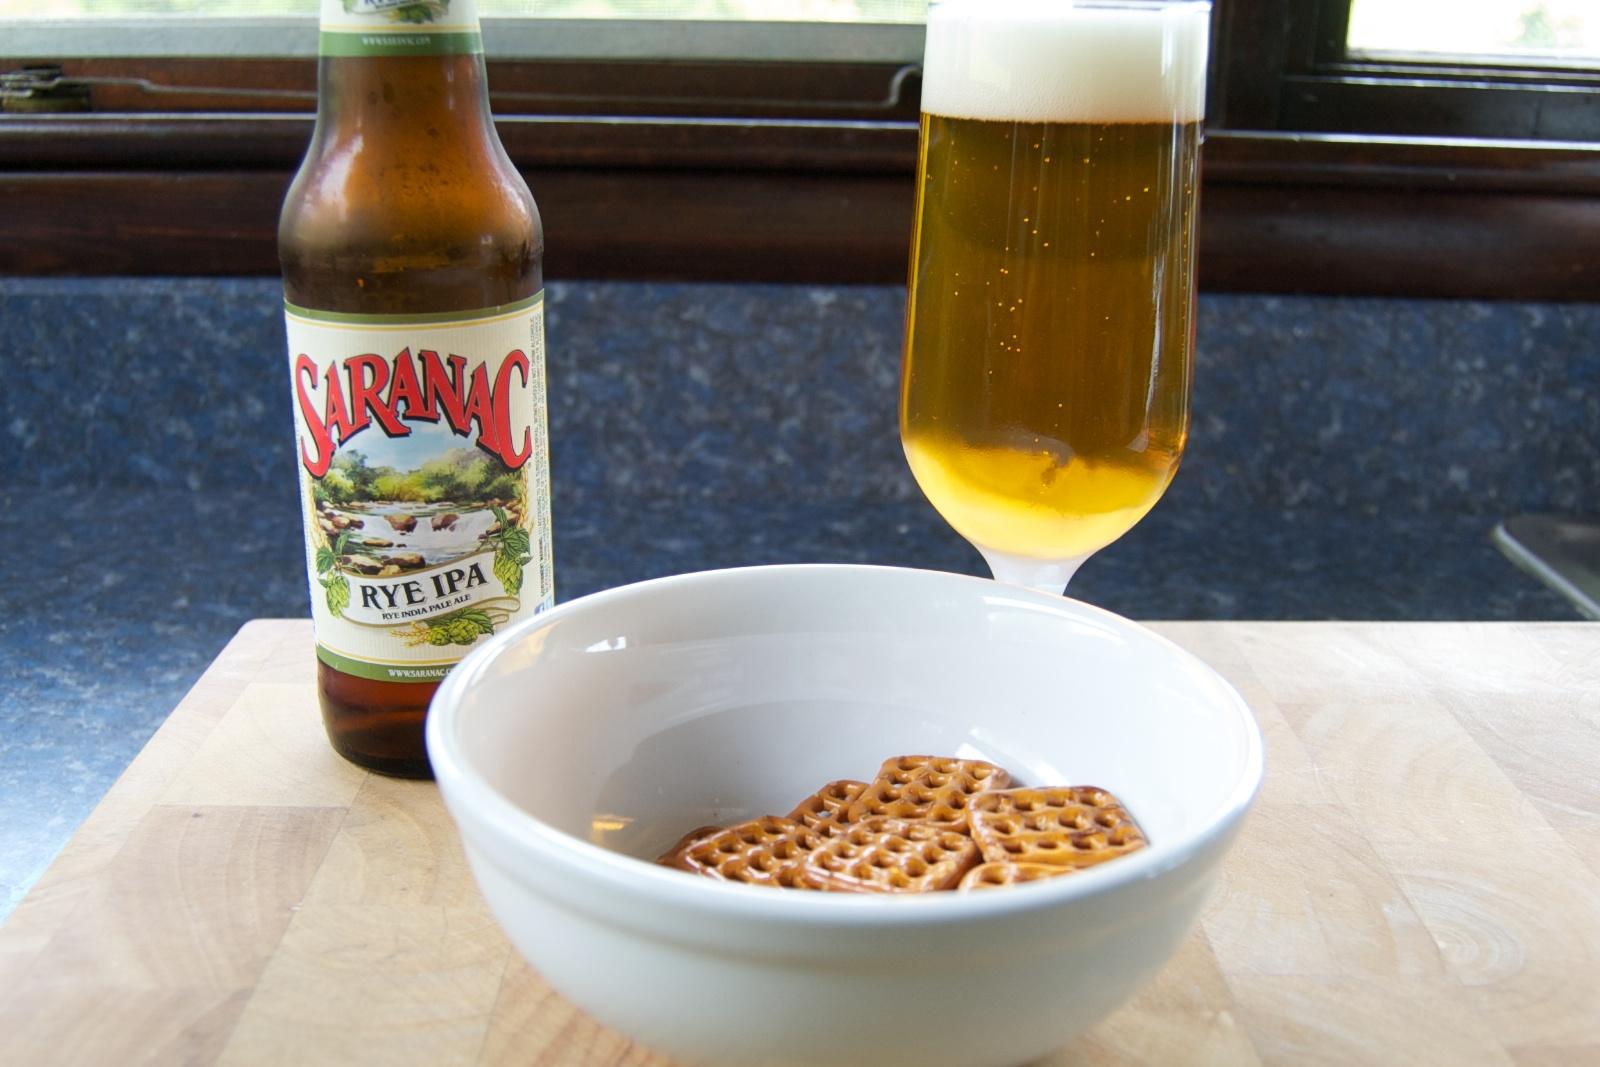 http://blog.rickk.com/food/2012/06/10/ate.2012.06.10.s1.jpg